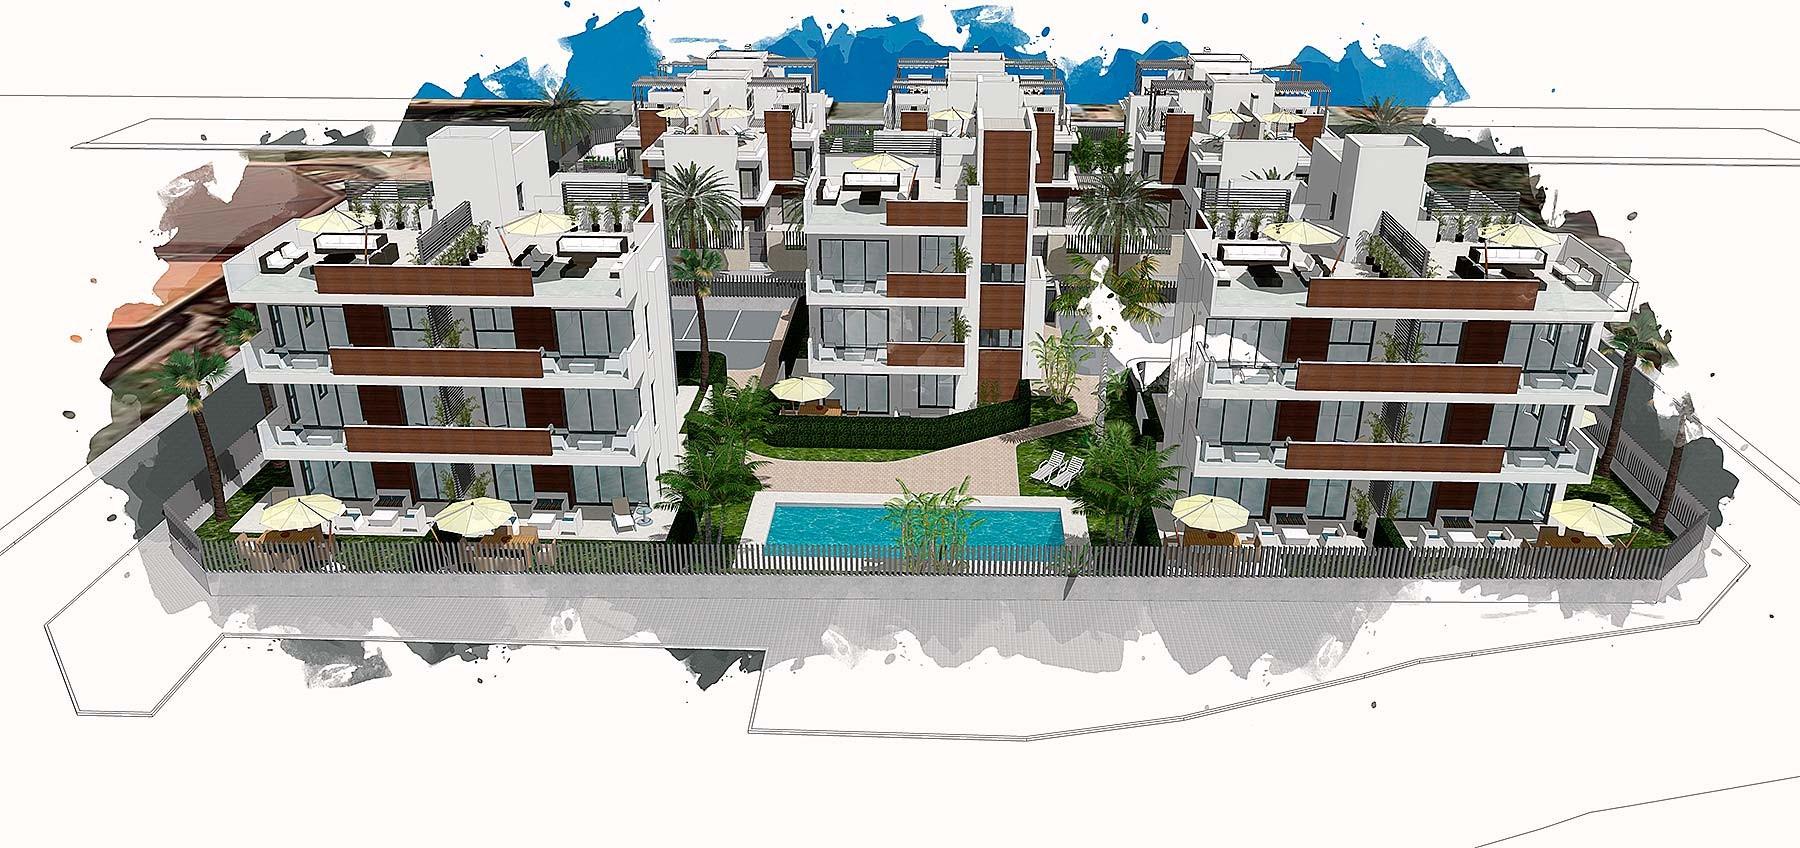 Апартаменты в Ла-Манга-дель-Мар-Менор, 3+1